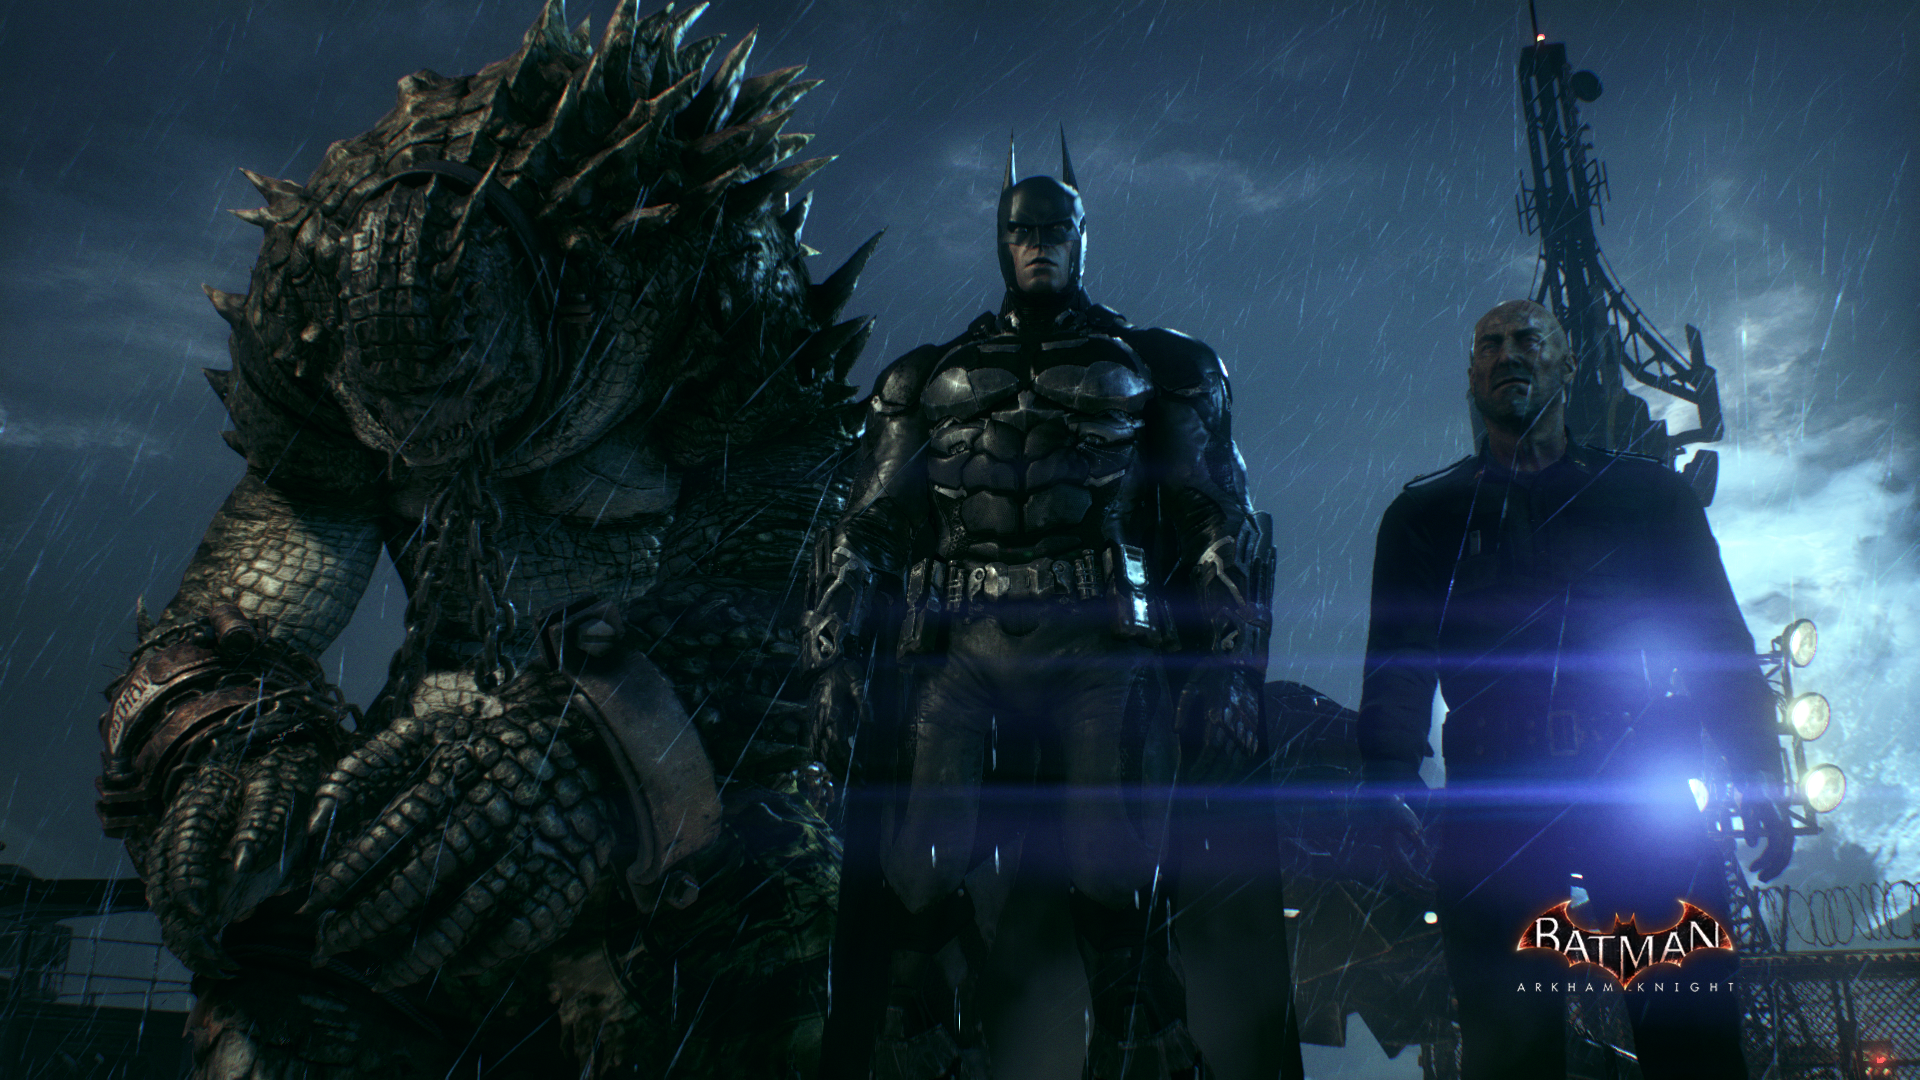 Batman  Arkham Knight 07.07.2017 - 21.32.47.12.png - Batman: Arkham Knight